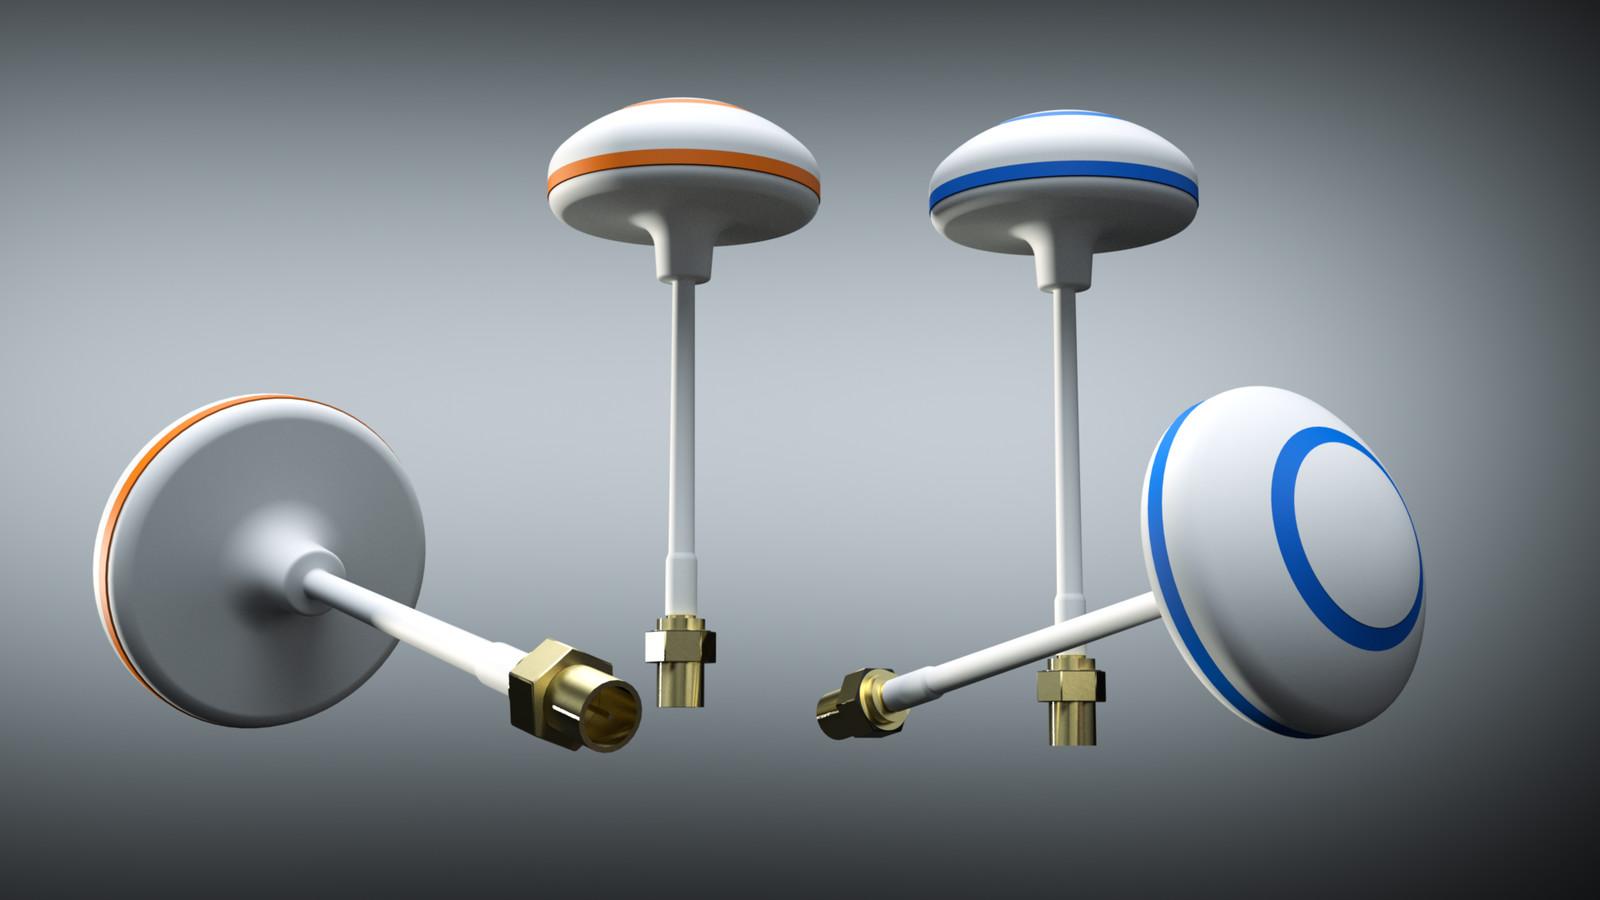 SU 2018 + Thea Render  Prelim build Clover Leaf Mushroom Aerial  Clover leaf Antenna 01-Scene 2 SU